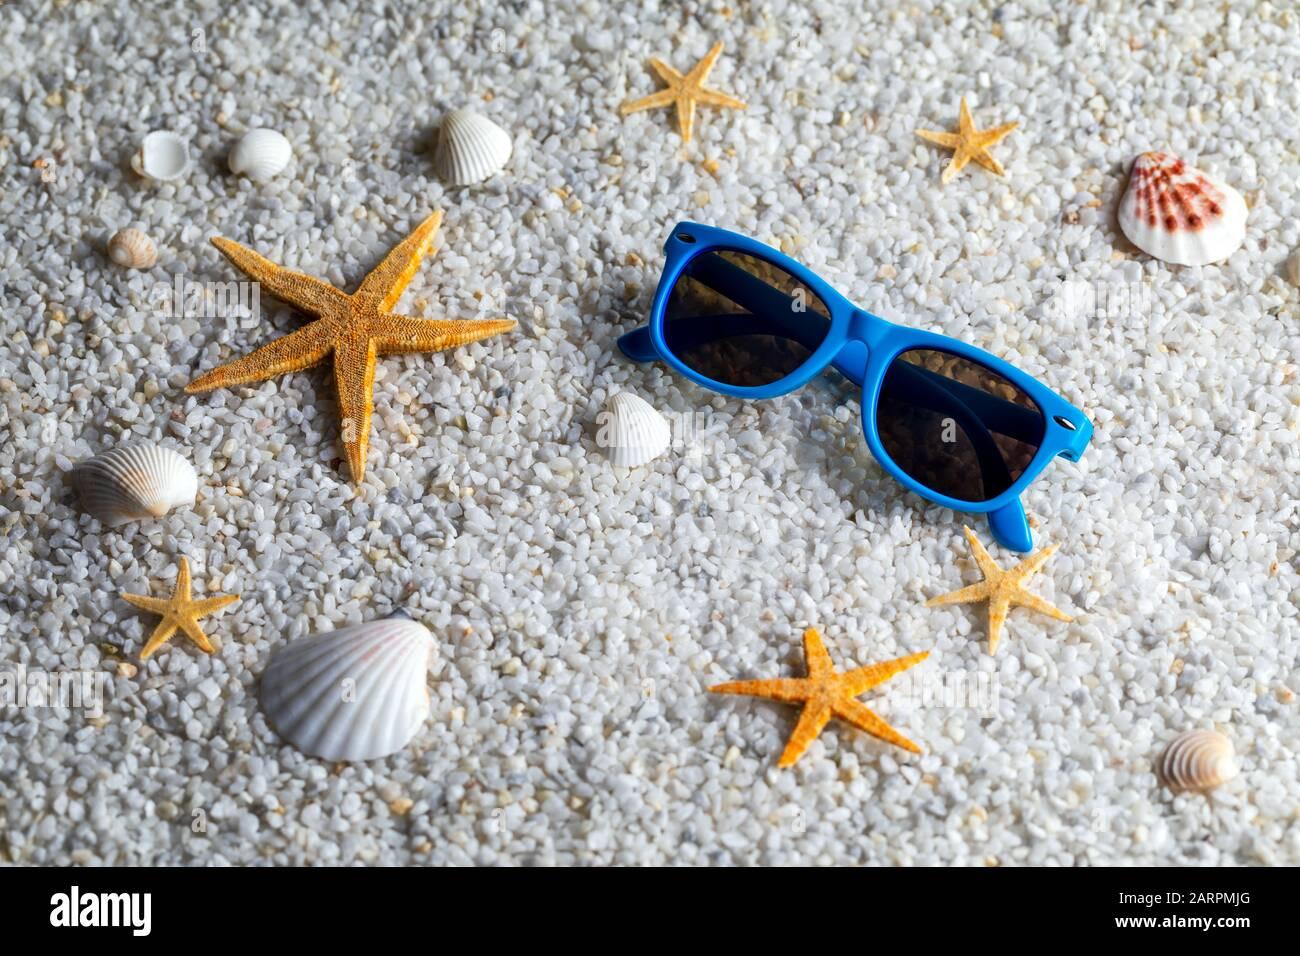 STARFISH SEA STAR+SEA SHELL SEASHELLS GLASSES SUNGLASSES-OCEAN COSTUME-DRESS UP